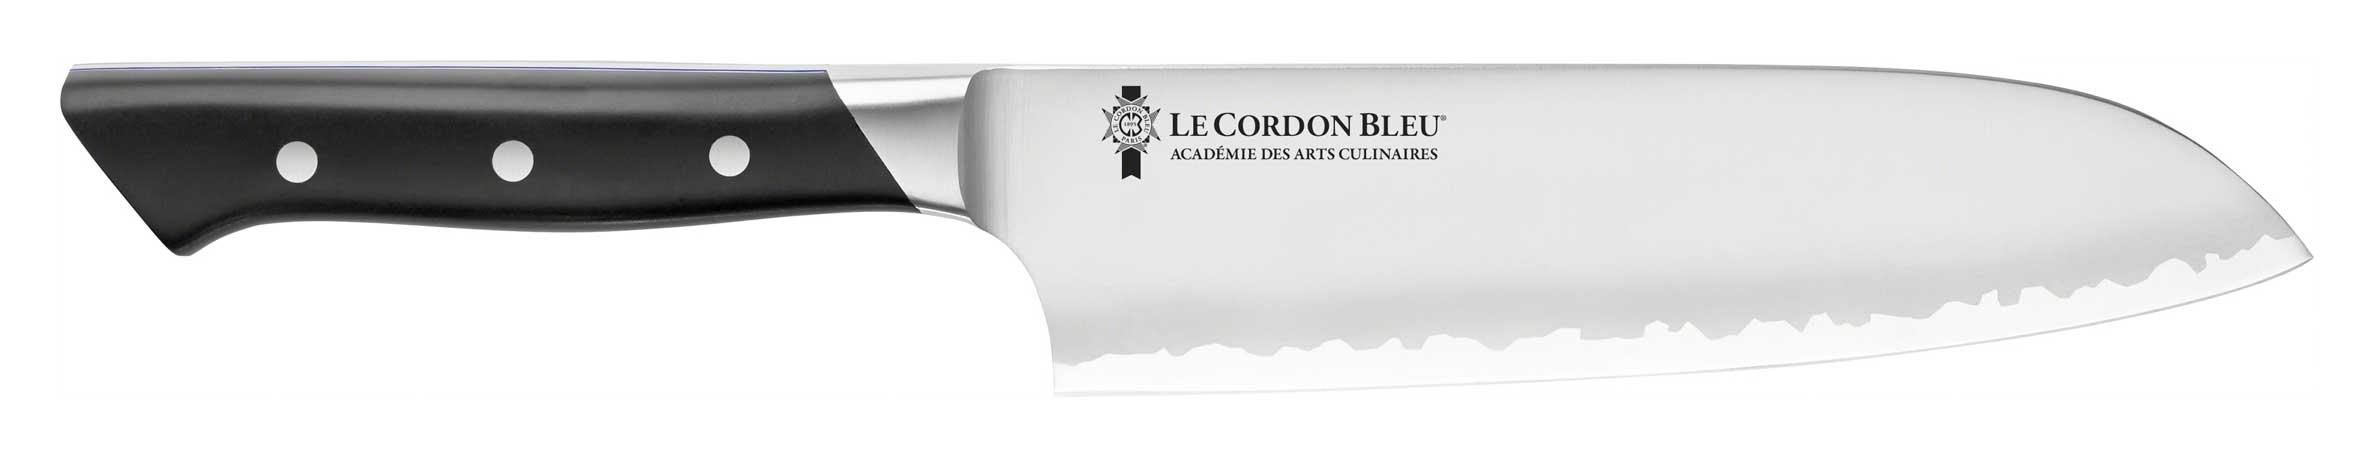 Profesionalhoreca, Zwilling, cuchillo Santoku, Le Cordon Bleu